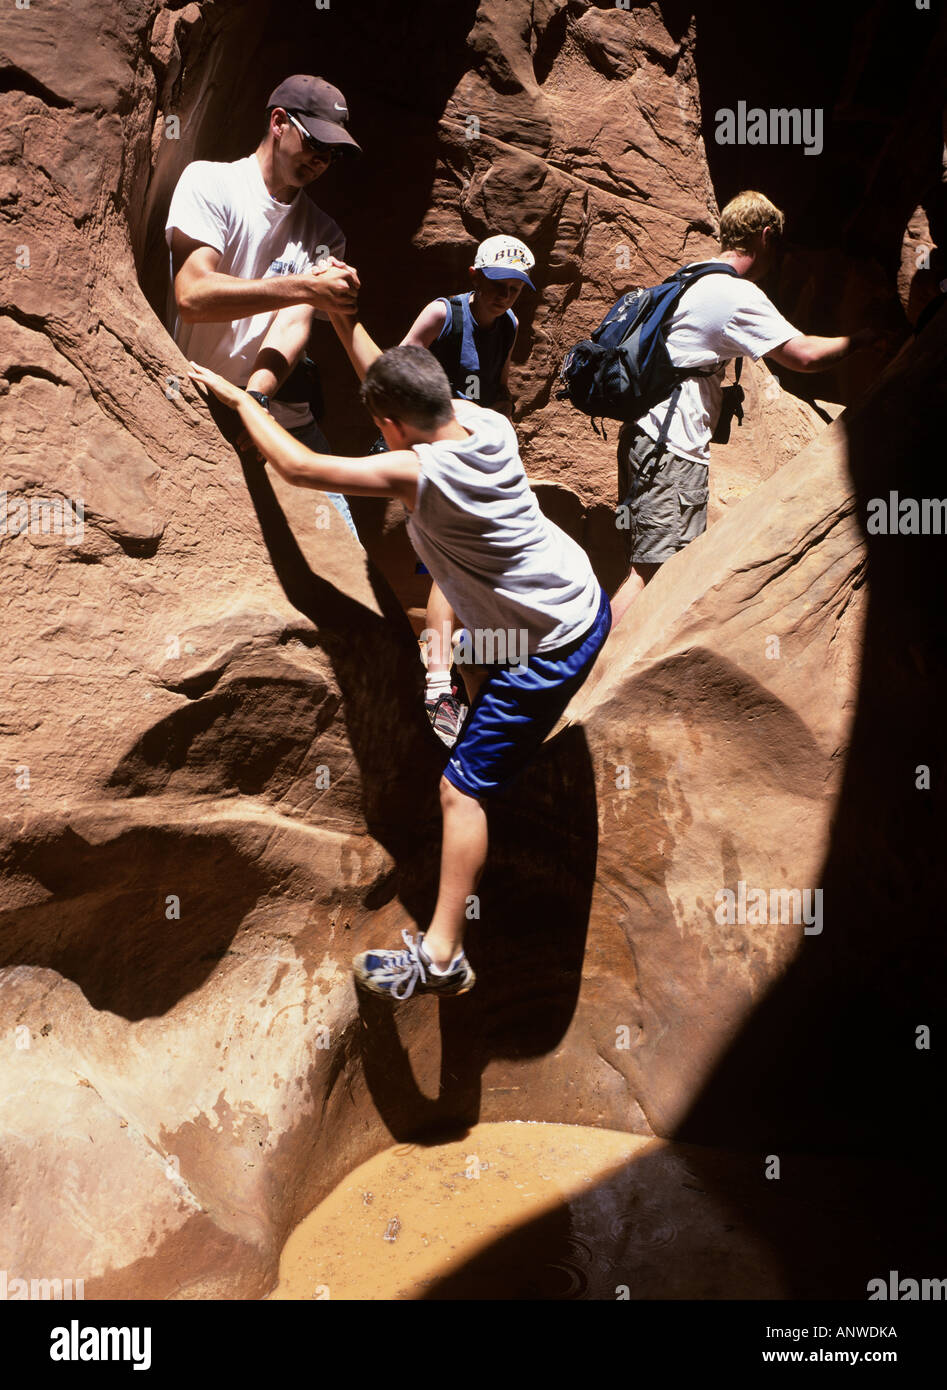 Hiker climb over a pond in the Peek a Boo Slot canyon, Great Staircase-Escalante NP, Utah, USA Stock Photo